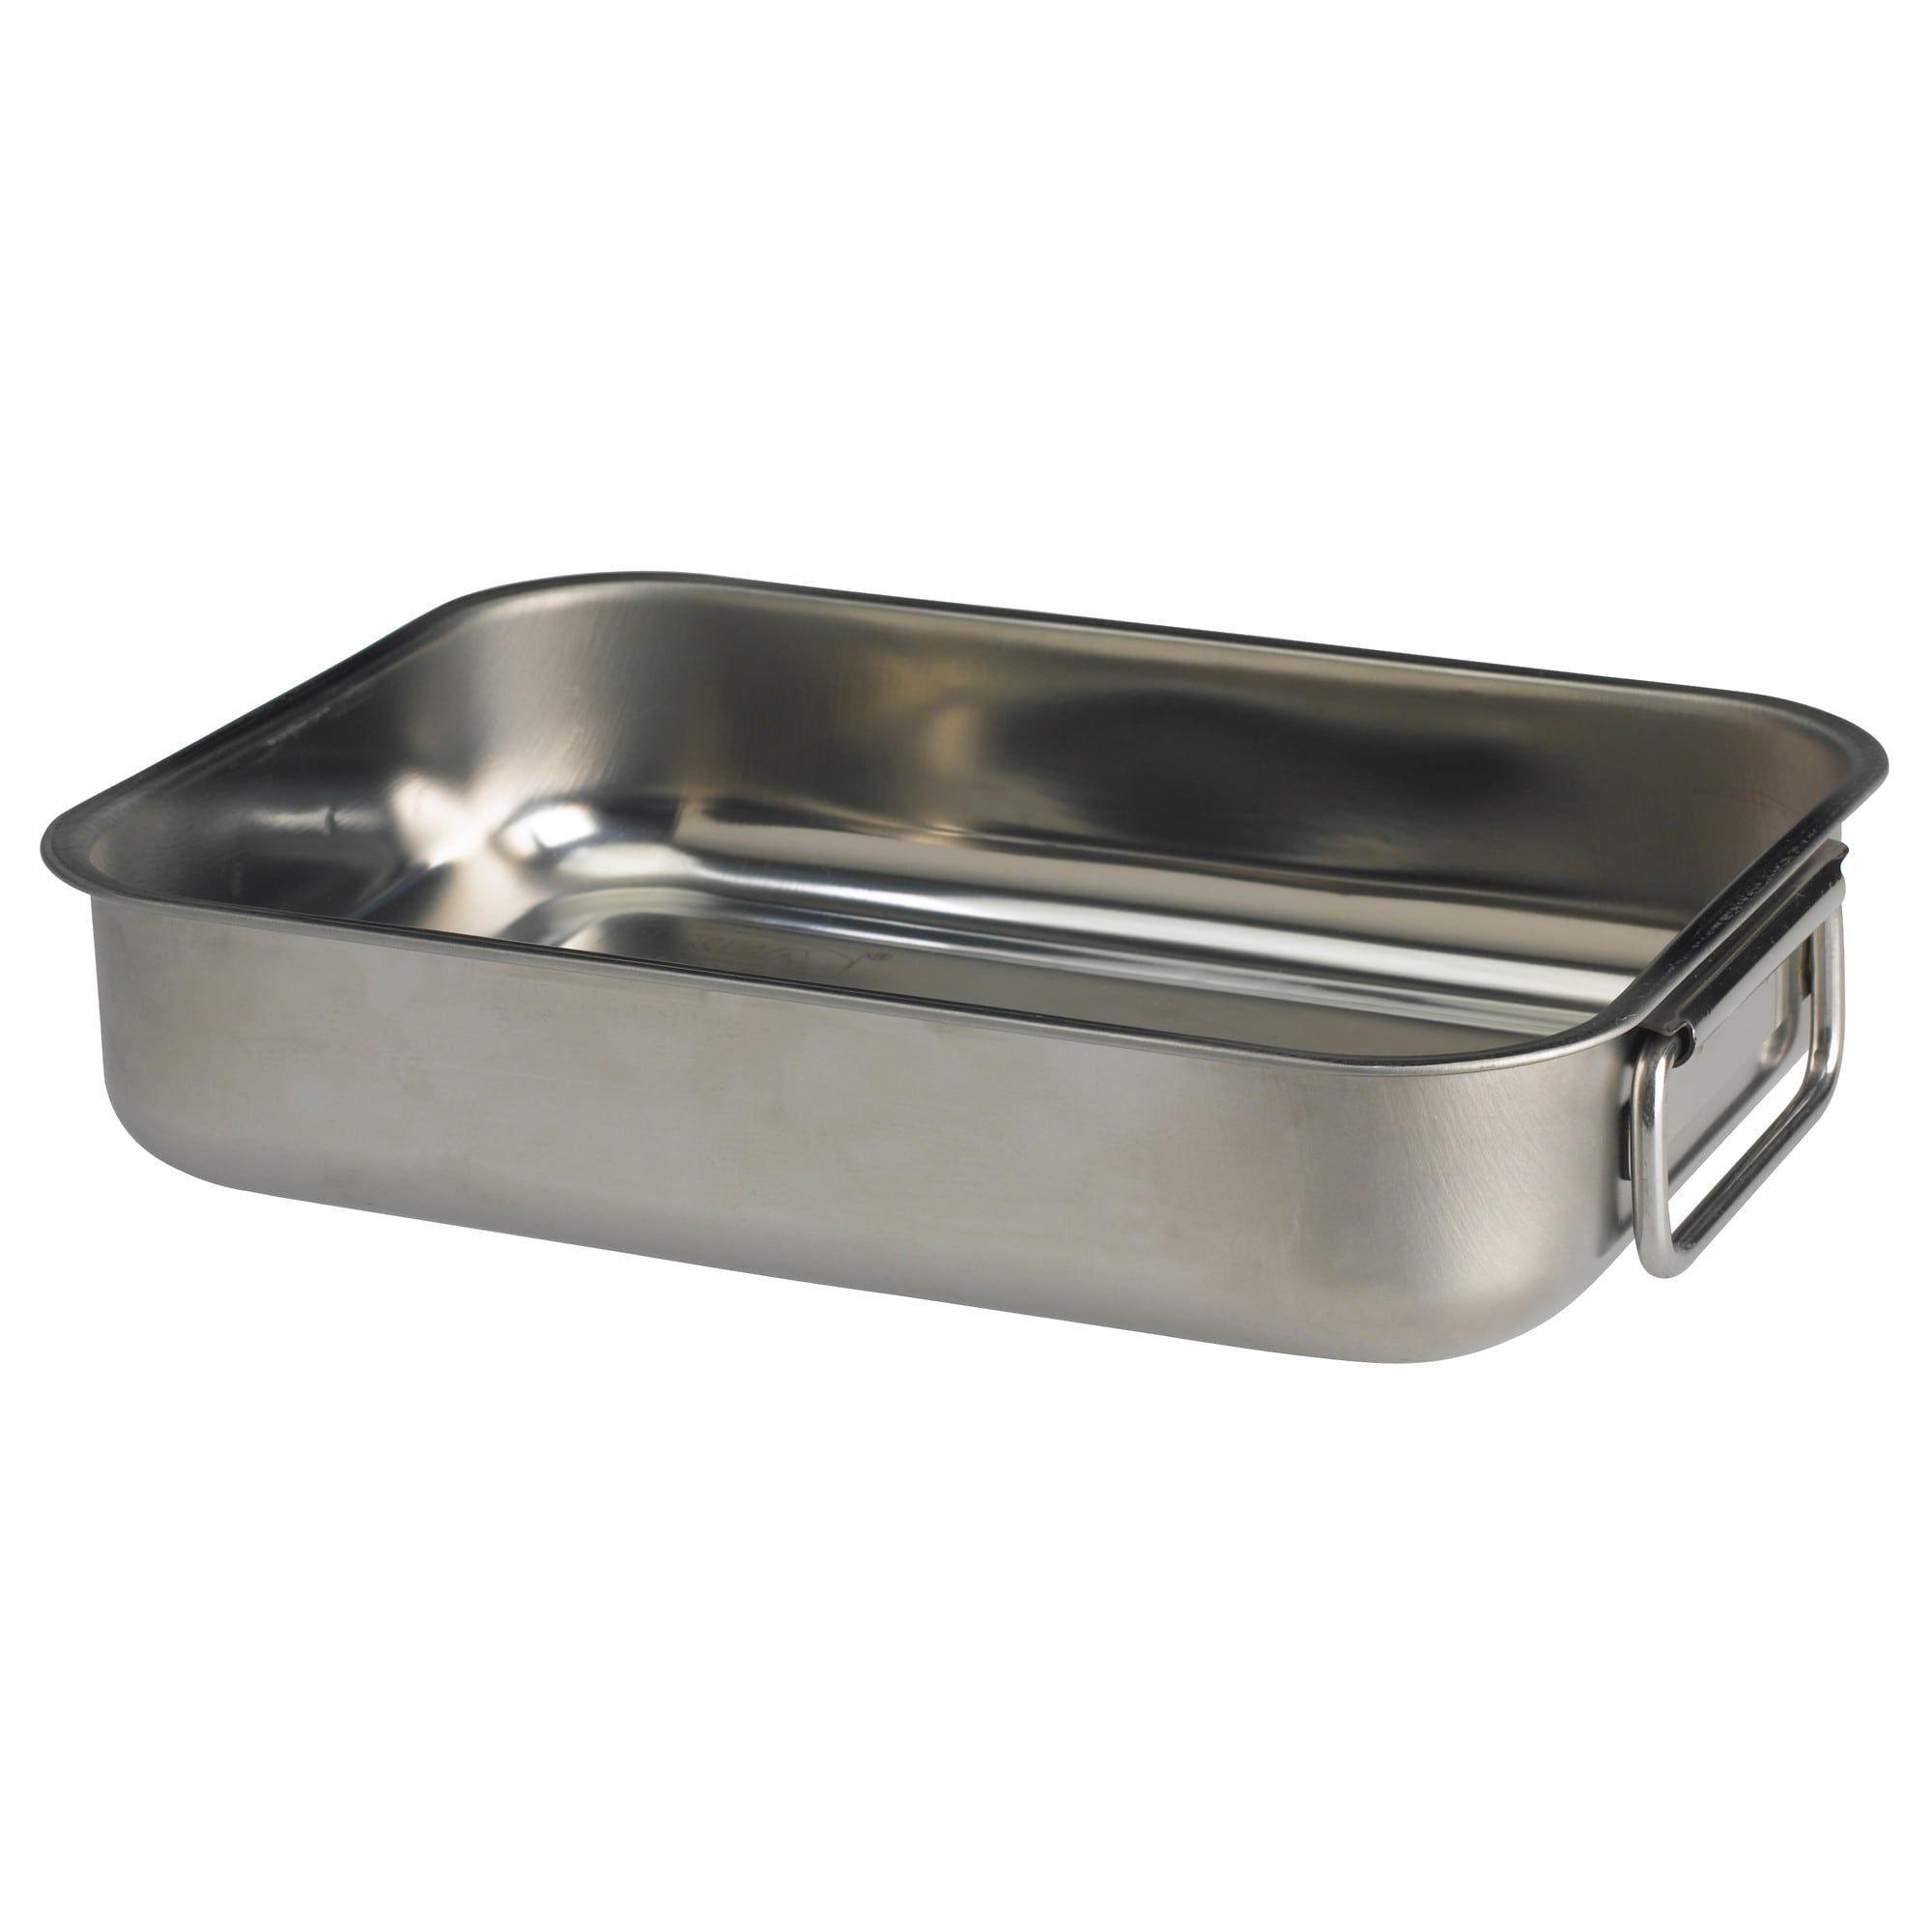 Koncis Roasting Pan Stainless Steel 10 X7 Shoe Cabinet Roasting Pan Hemnes Shoe Cabinet